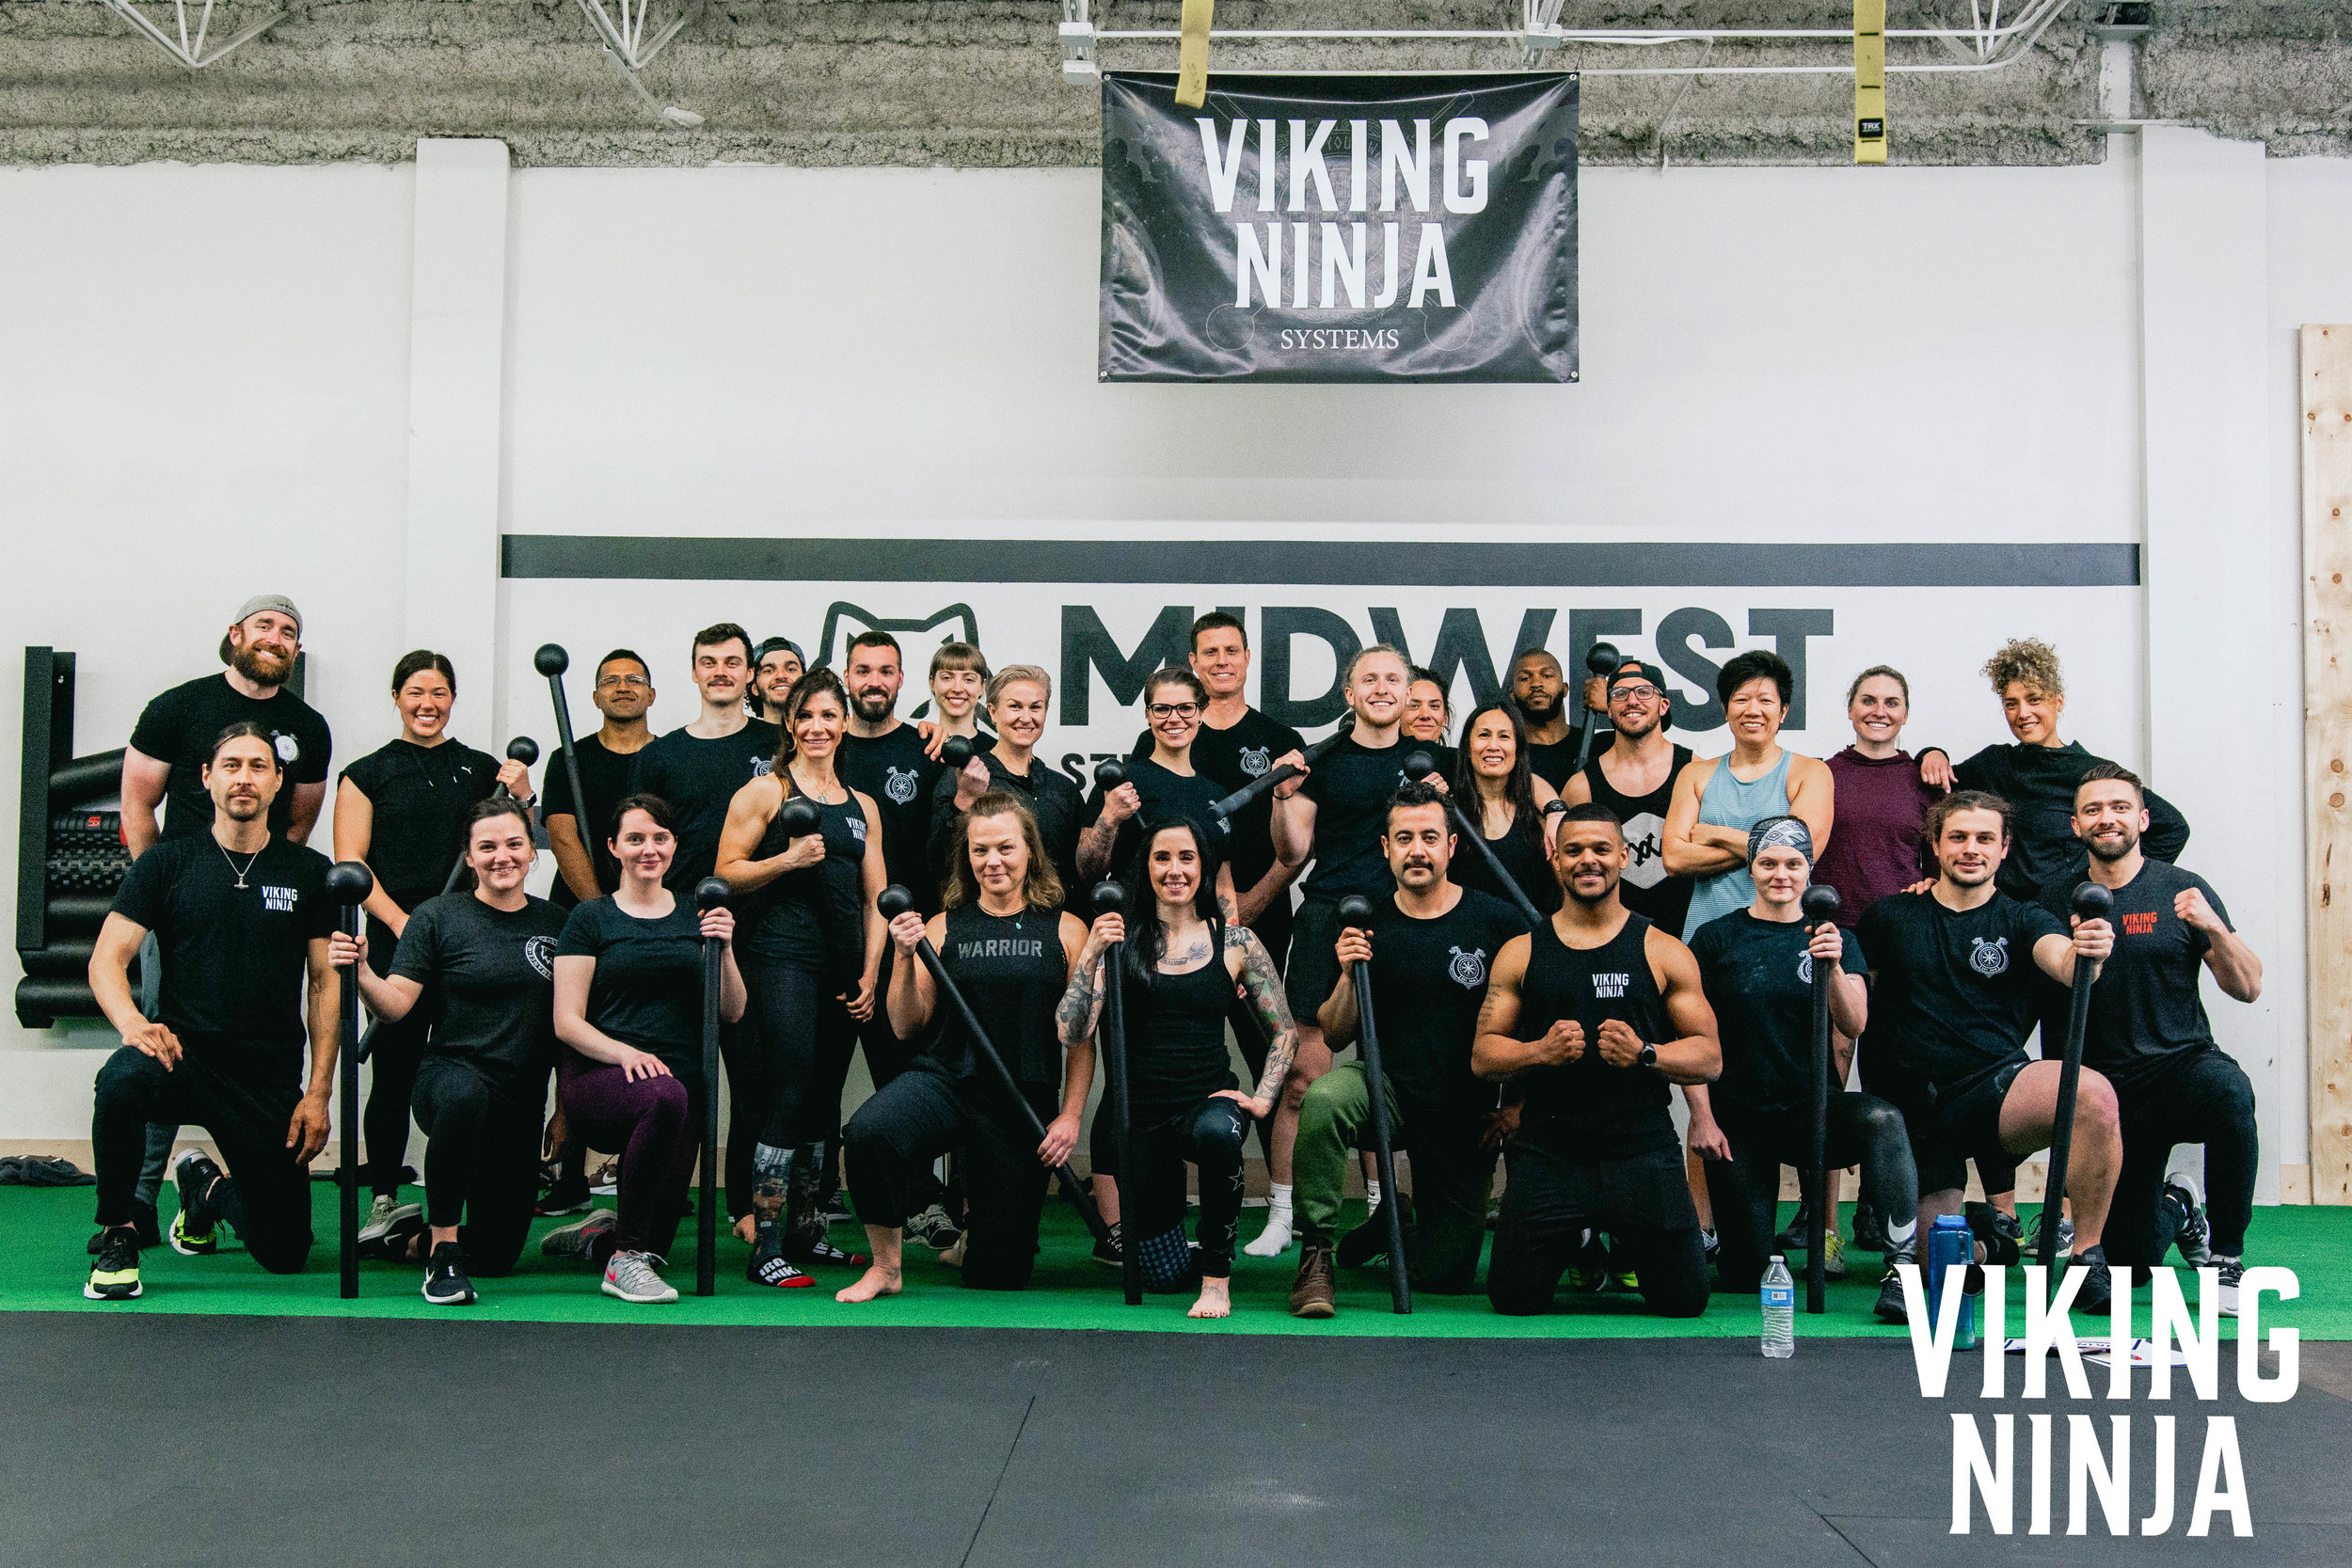 Viking Ninja Fitness Training System Chicago and Viking Ninja Women Community